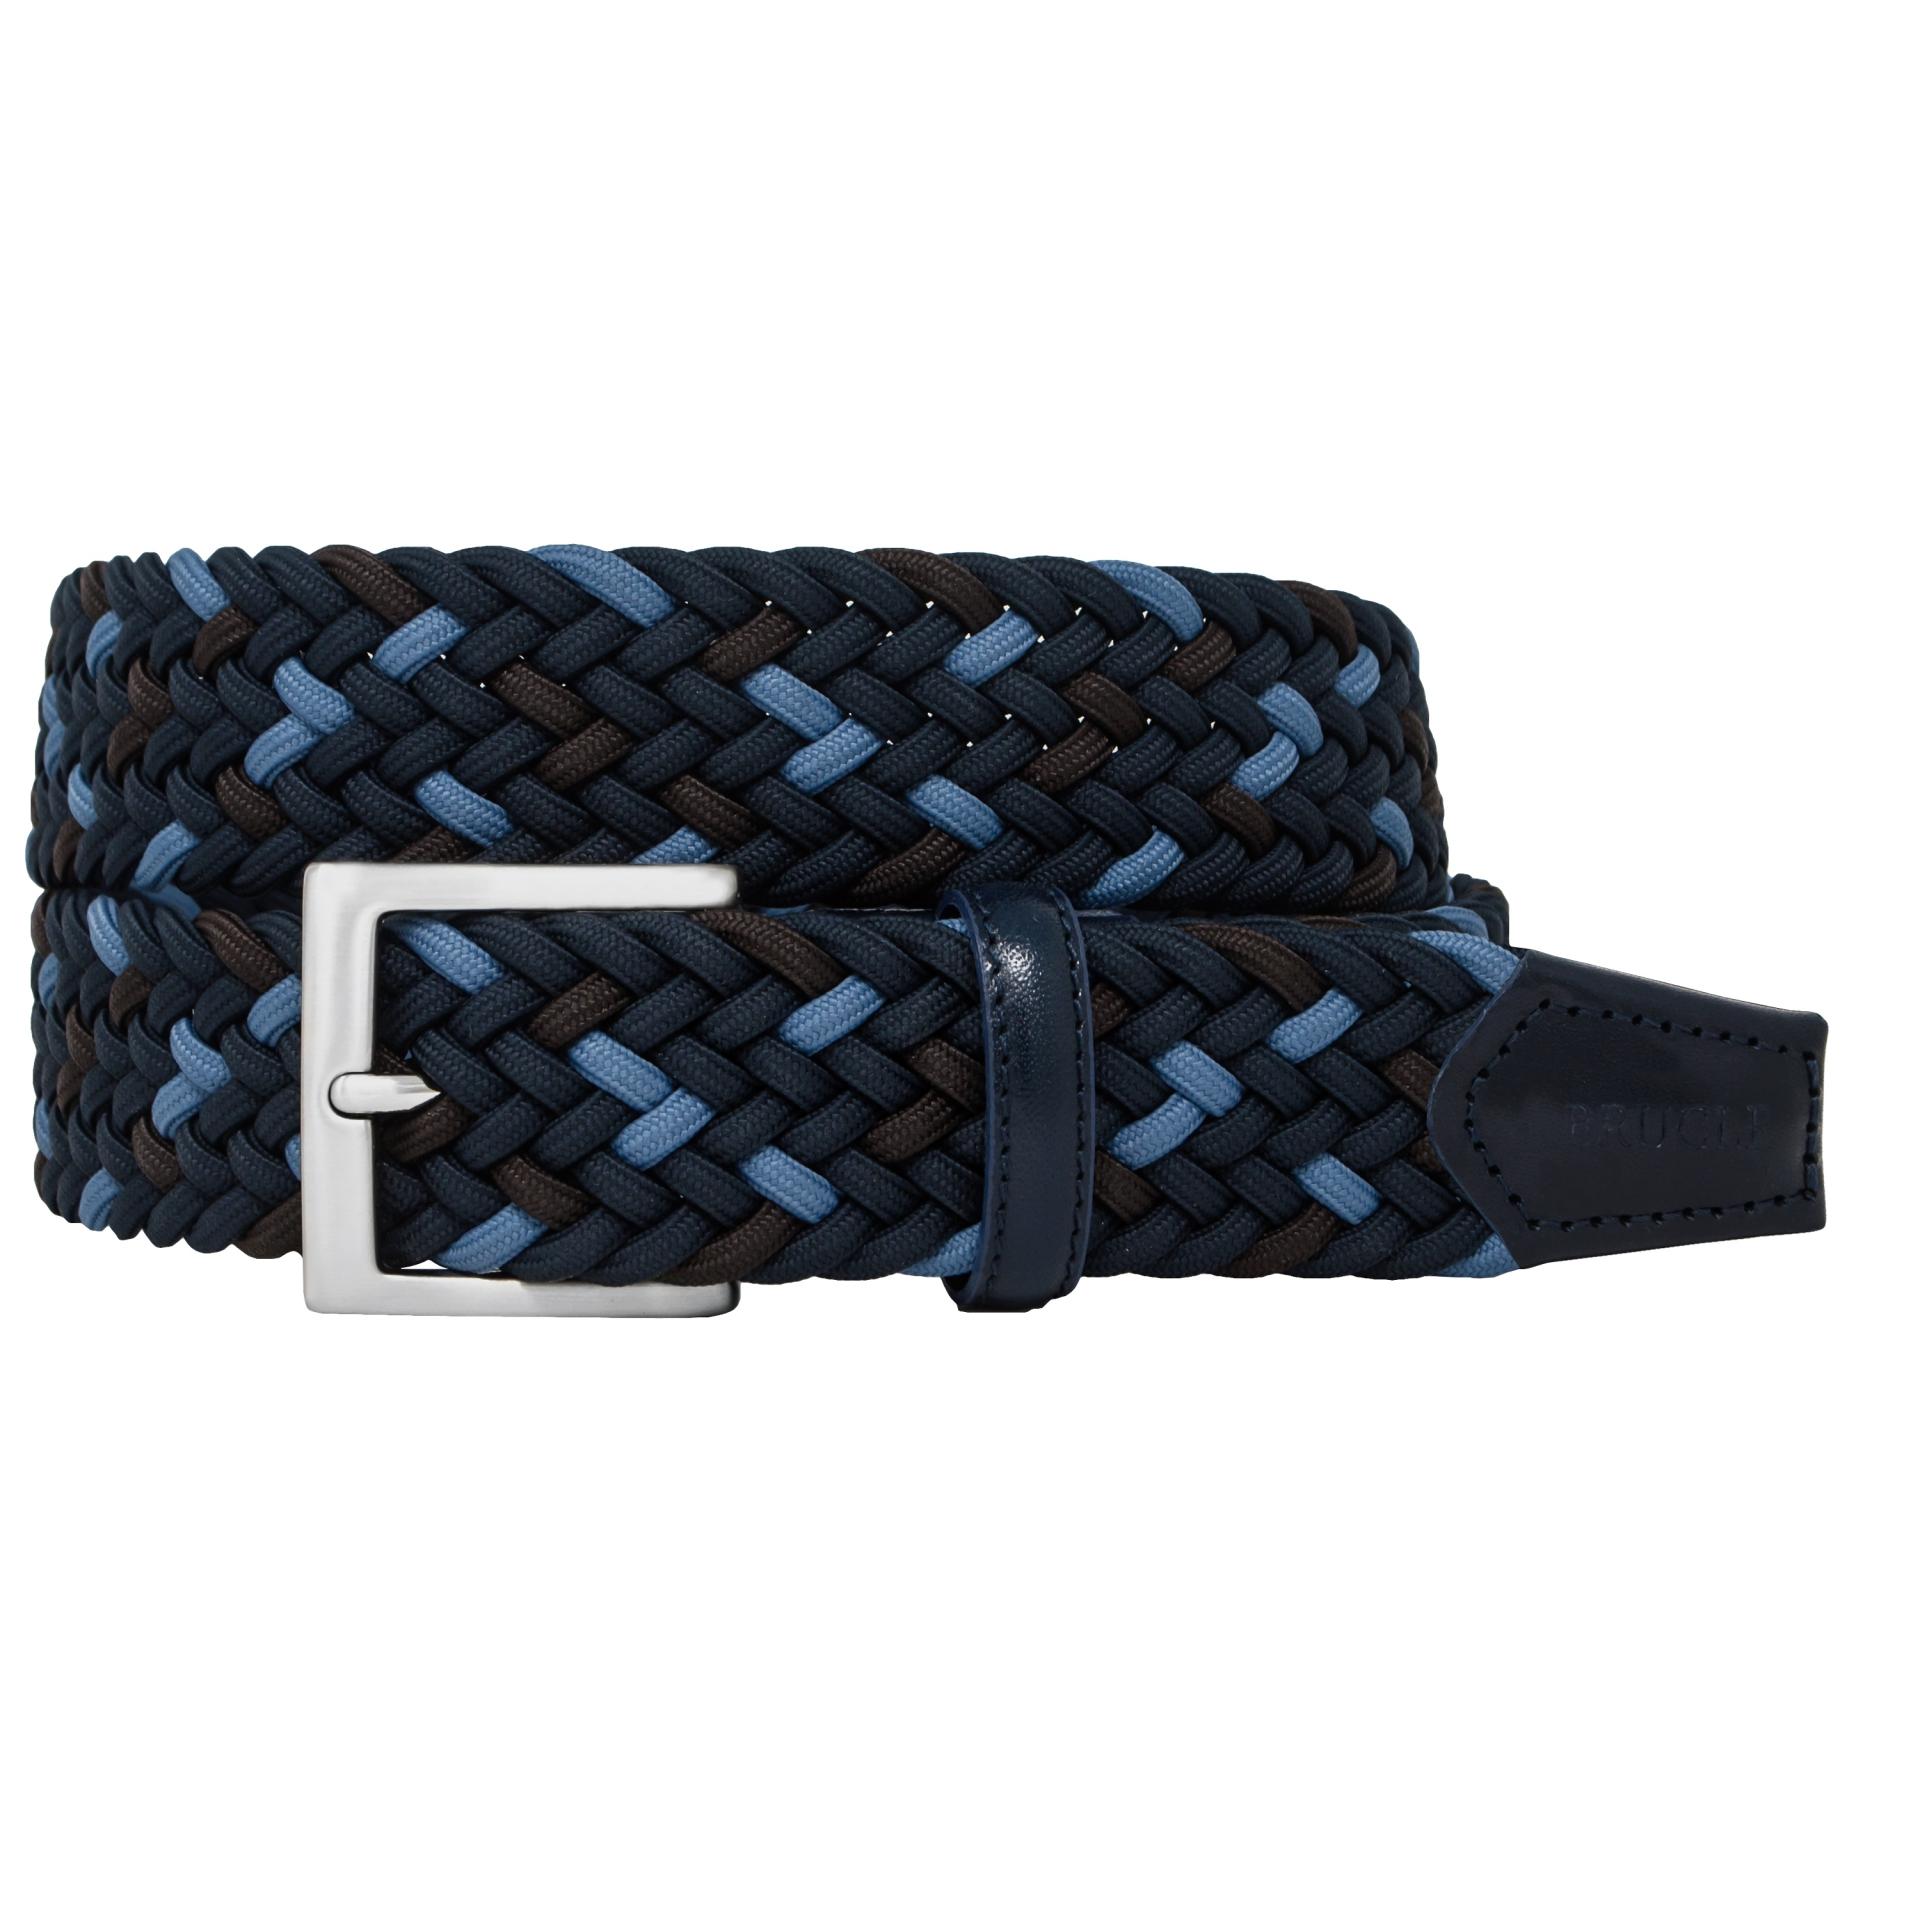 Braided Elastic Belt tricolor blue brown sky